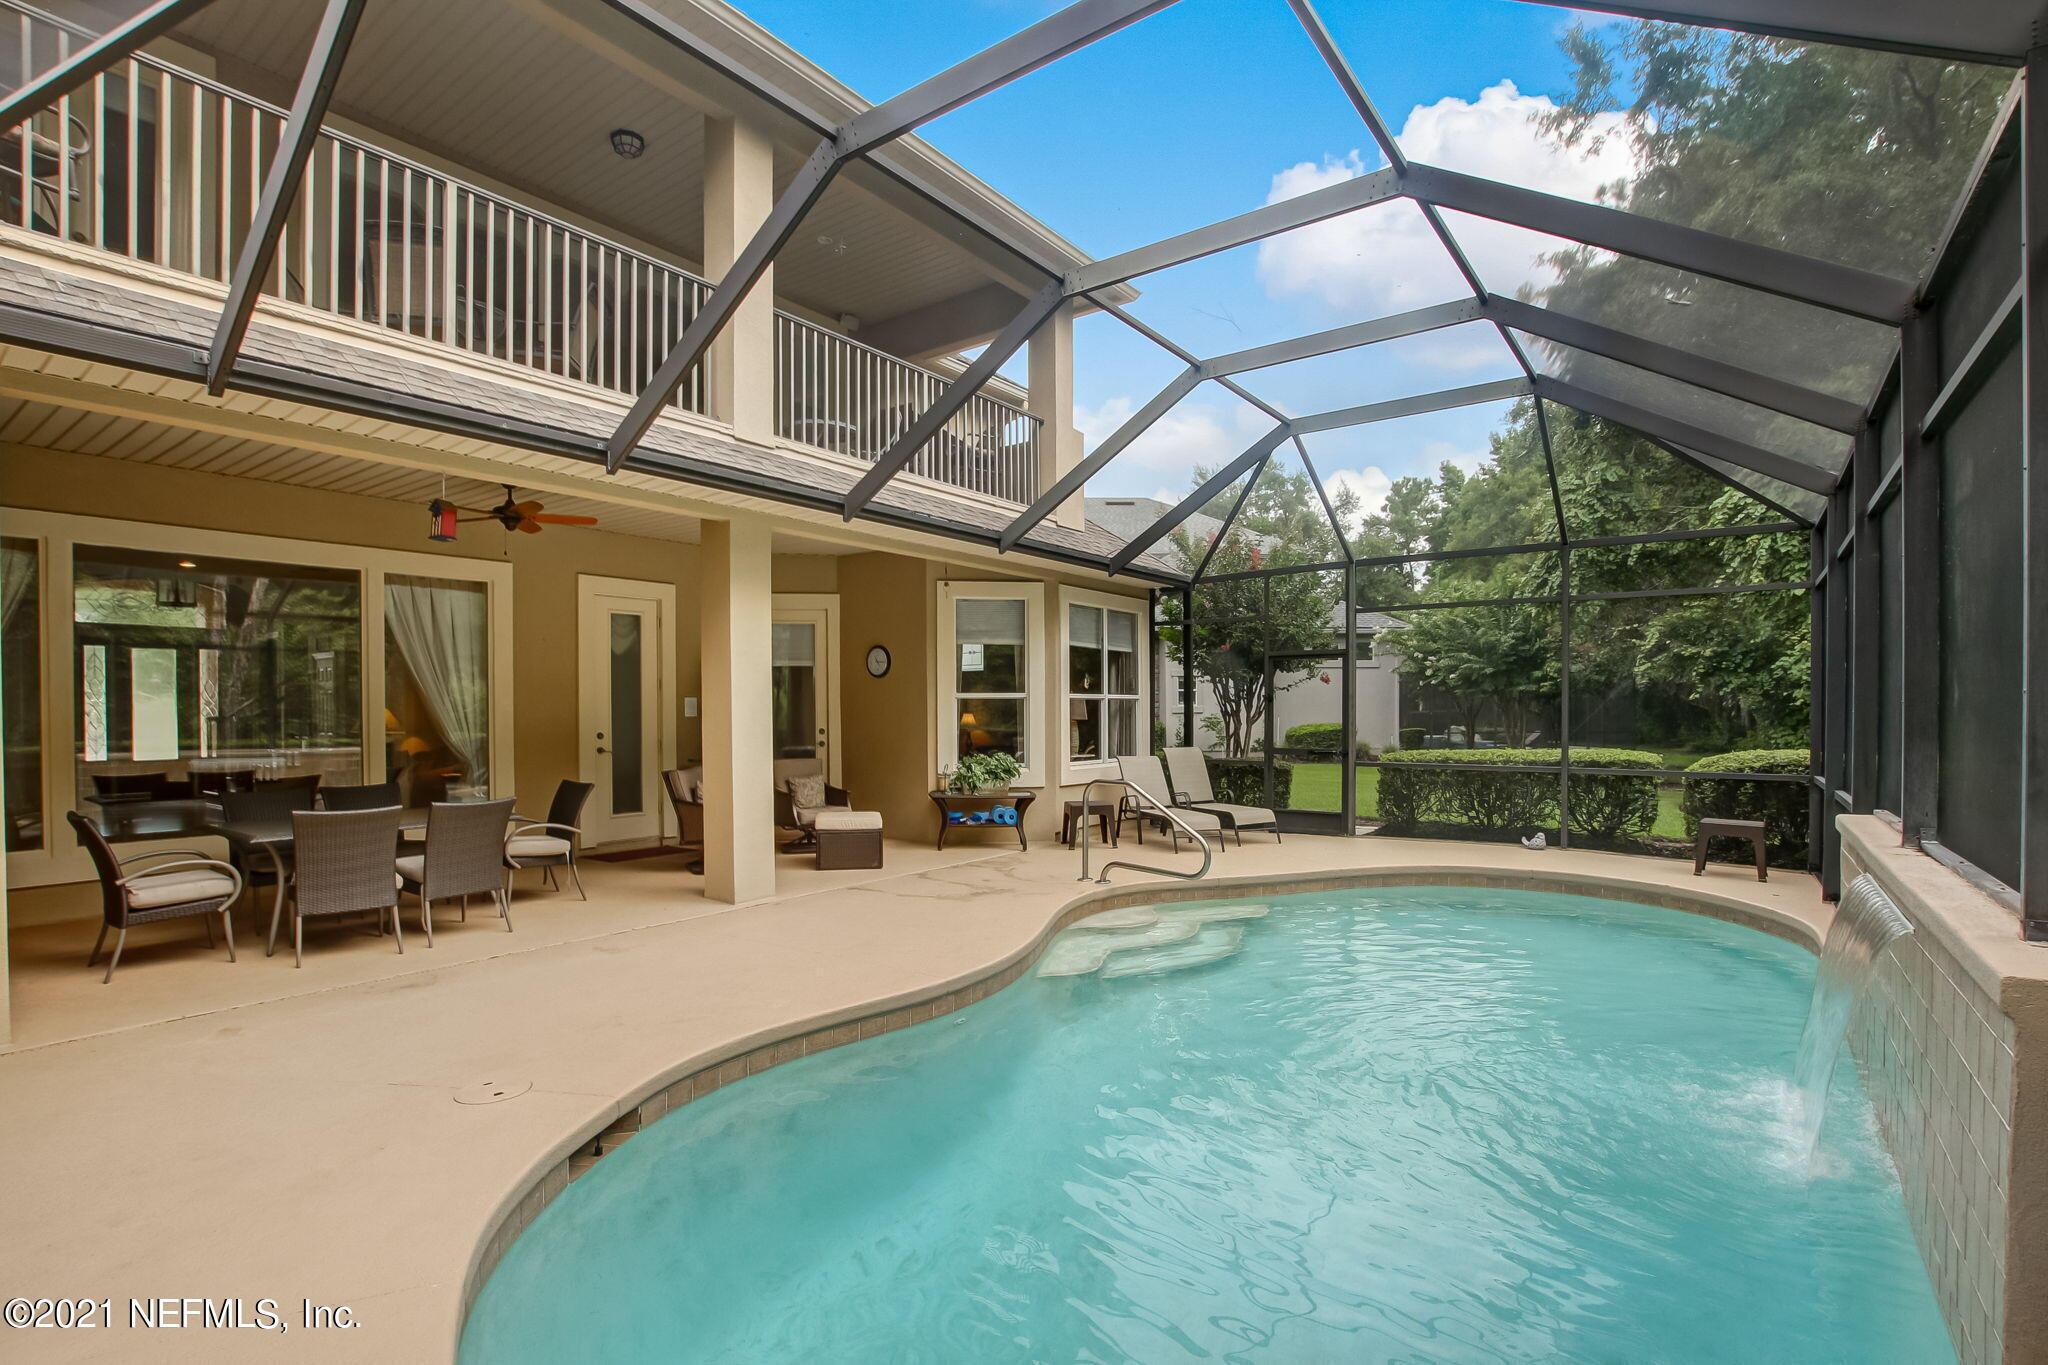 1908 SOLSTICE, ST AUGUSTINE, FLORIDA 32092, 5 Bedrooms Bedrooms, ,4 BathroomsBathrooms,Residential,For sale,SOLSTICE,1119055